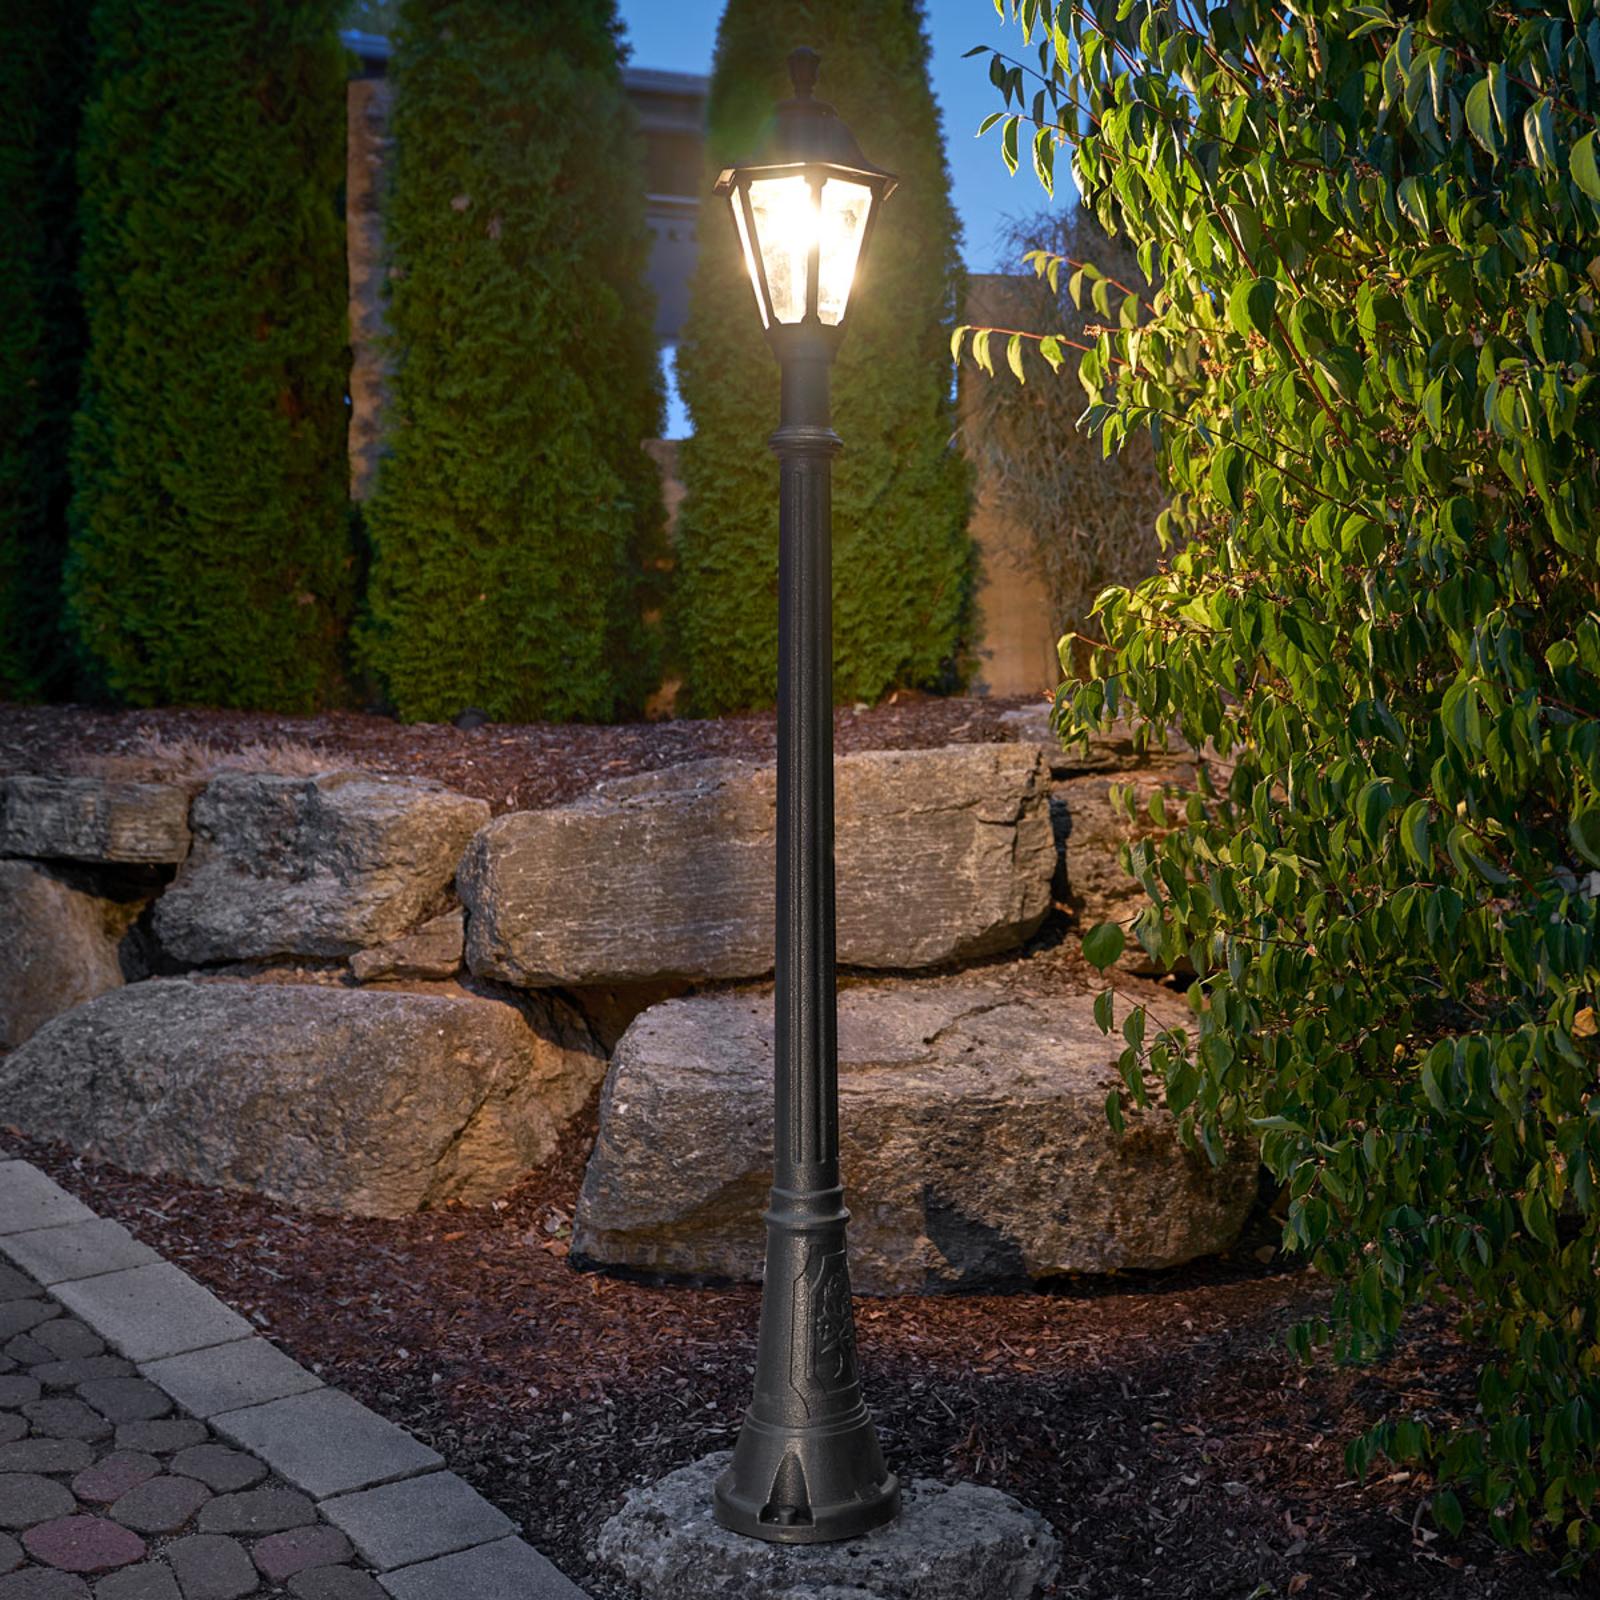 Lampadaire LED Artu Rut I55 - pour milieu marin